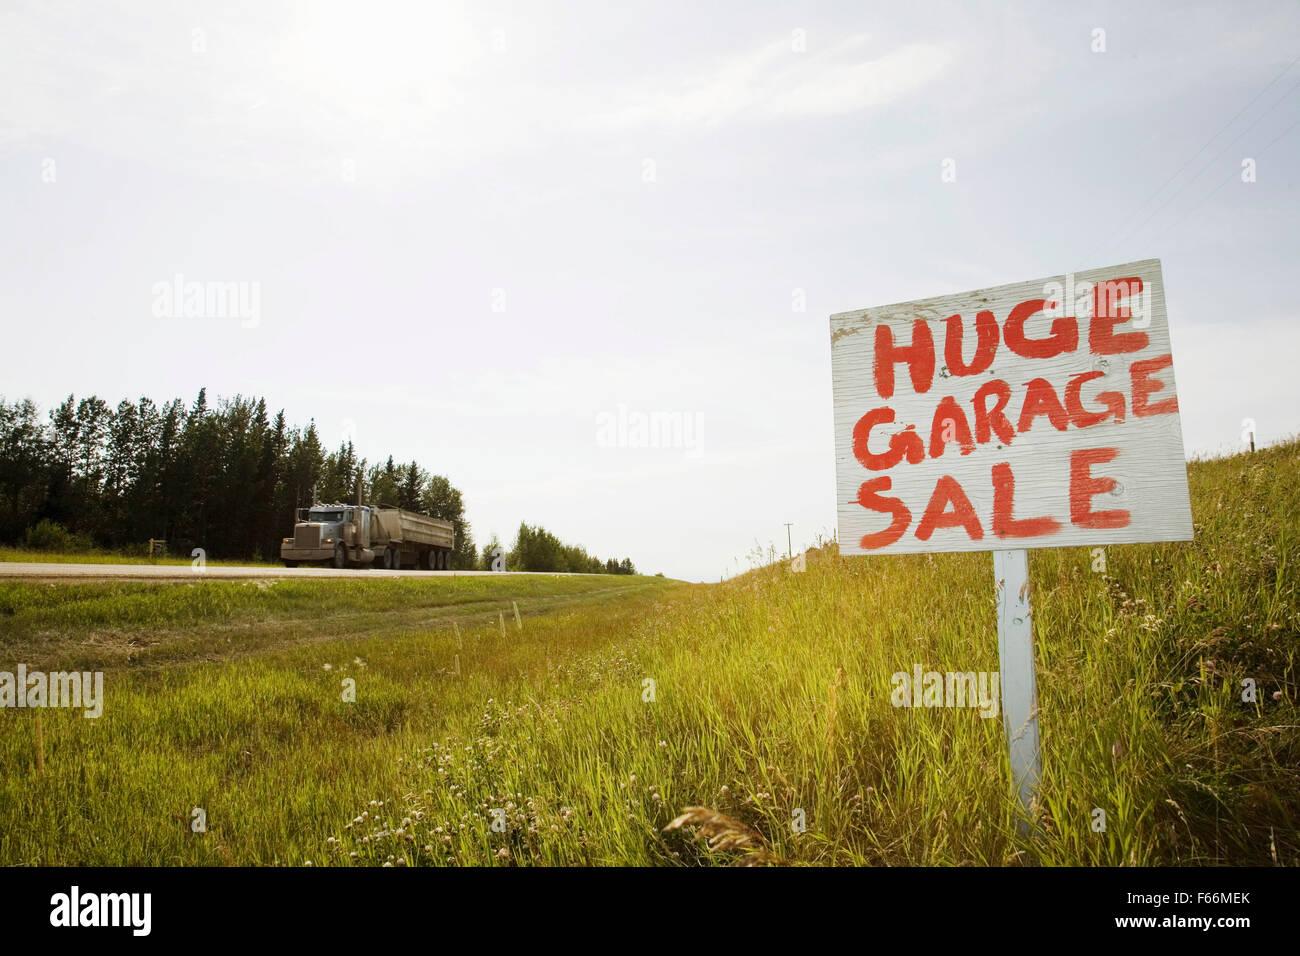 garage sale sign Central Alberta. Canada - Stock Image